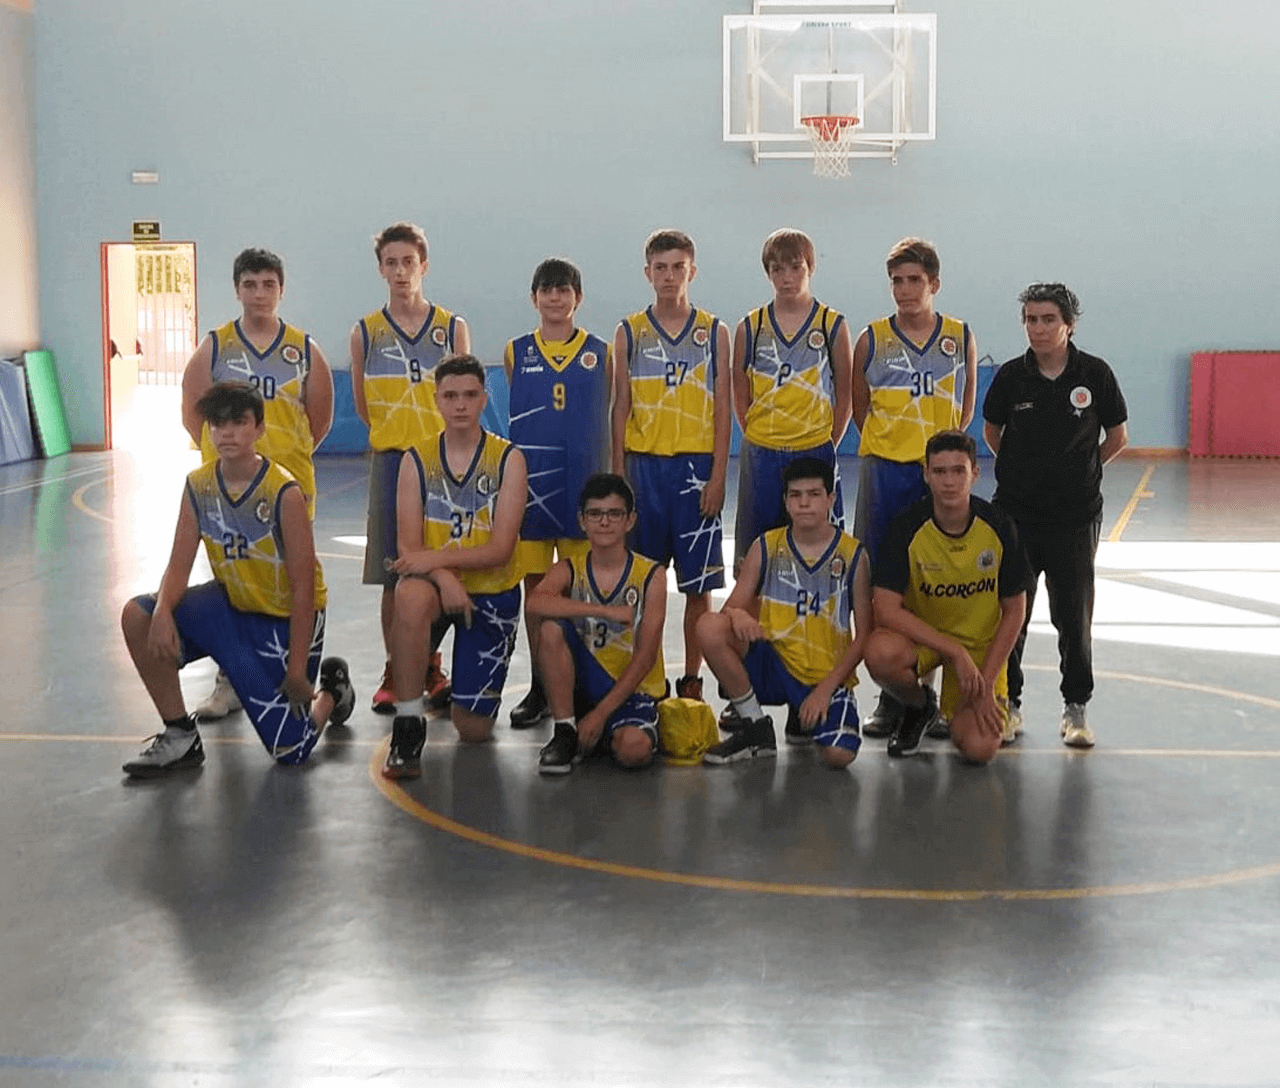 https://clubbaloncestoalcorcon.com/wp-content/uploads/2019/10/Cadete-Azul-equipo.png